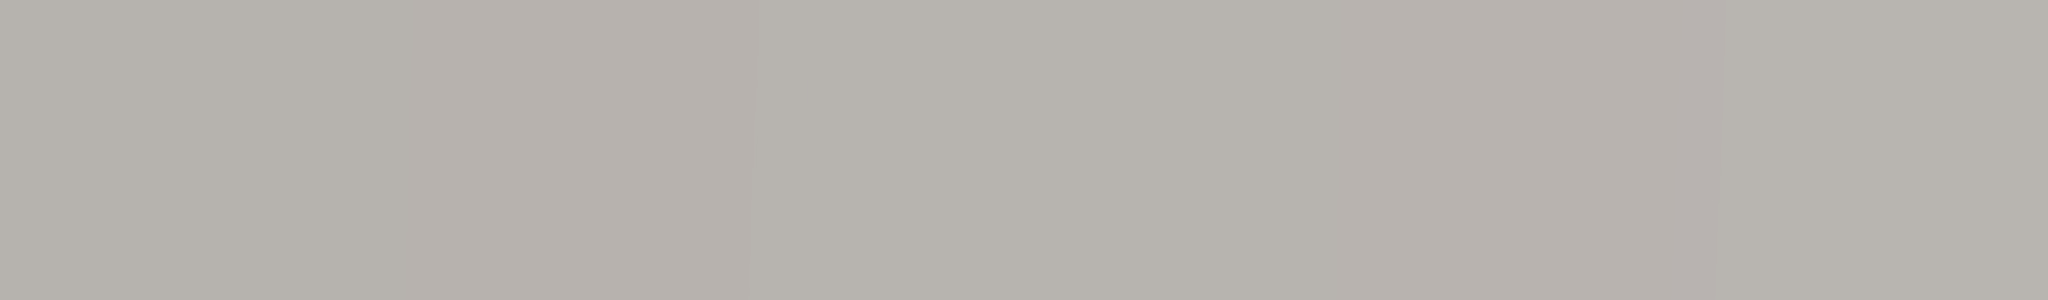 HU 175474 Акрил 3D кромка серая TopX